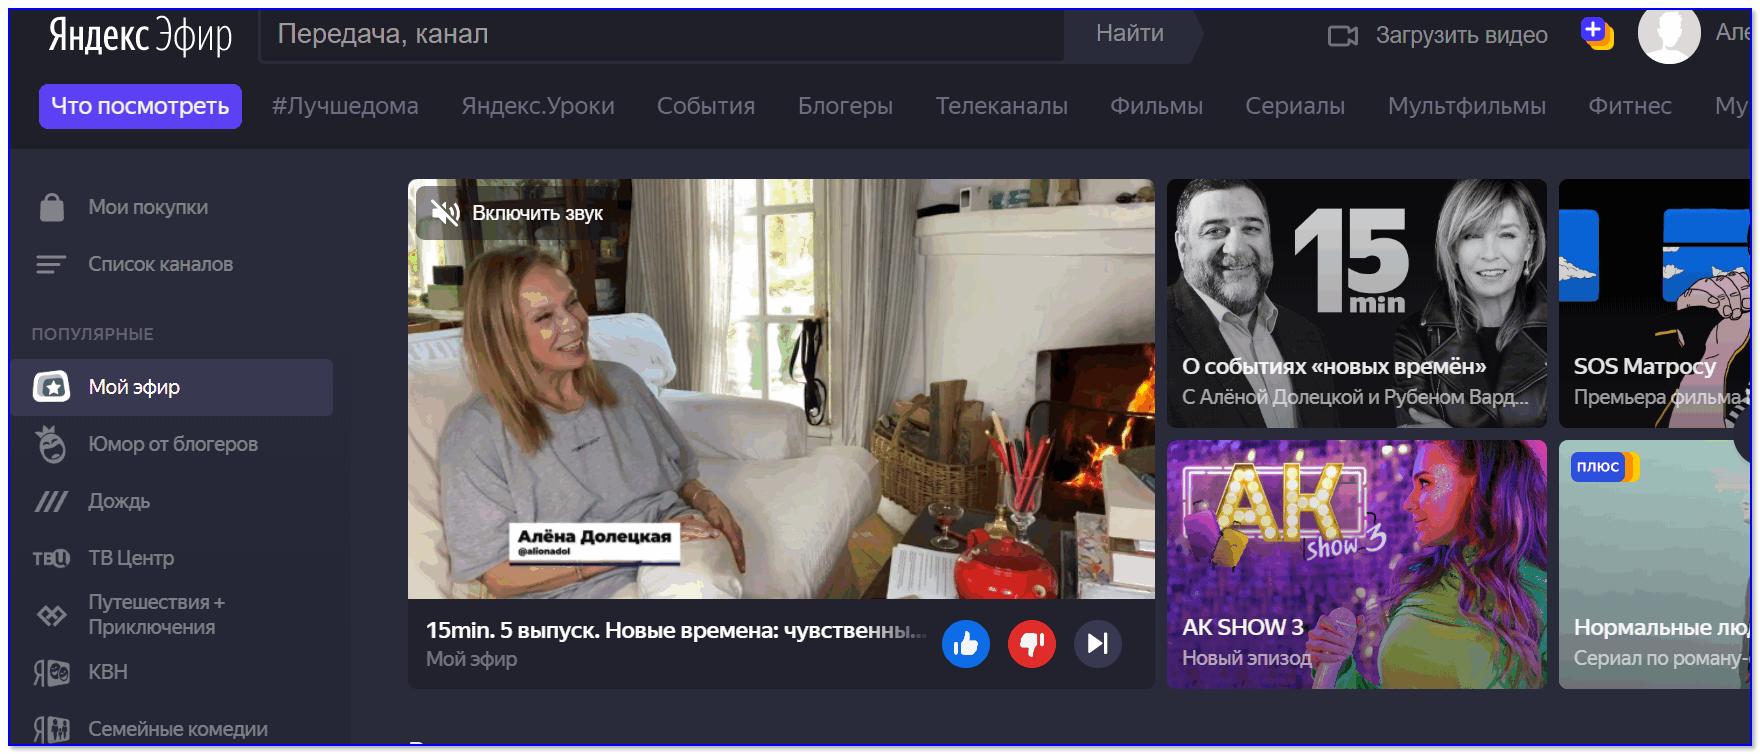 Скриншот с сайта Яндекс.эфир